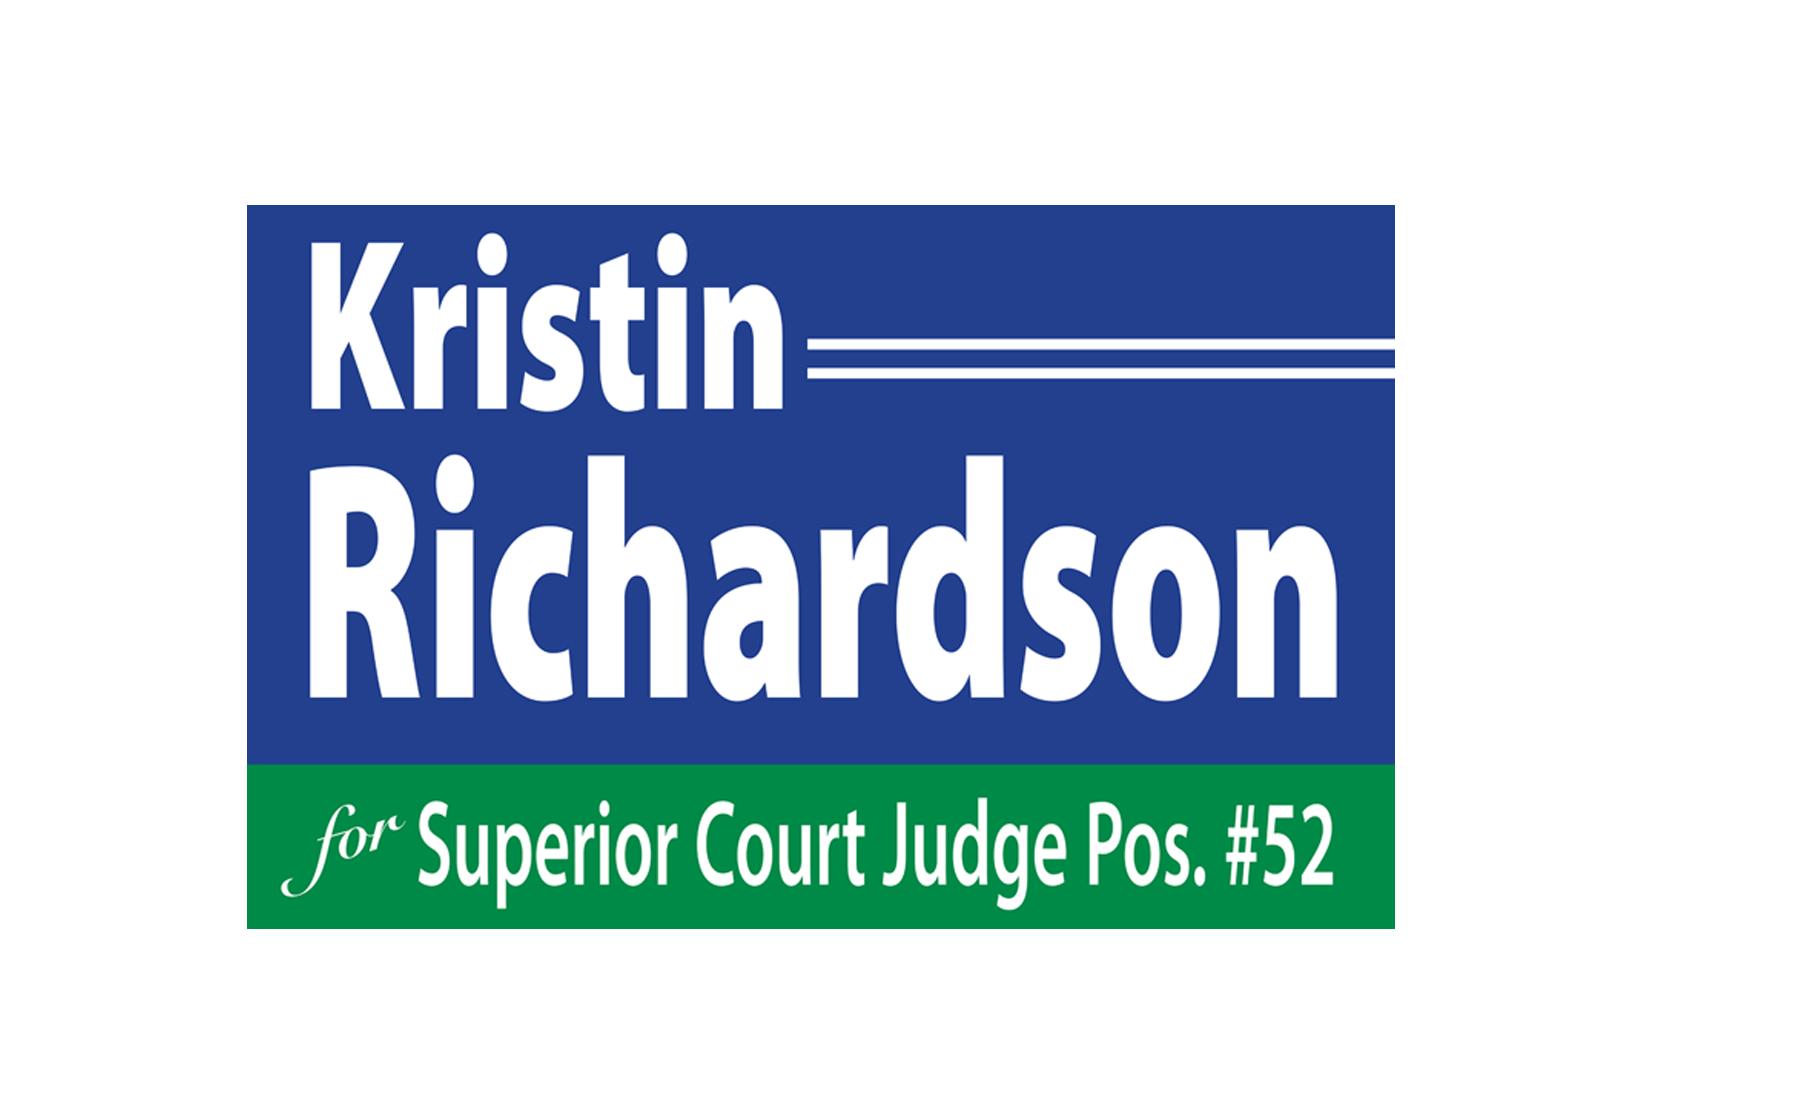 Kristin_Richardson